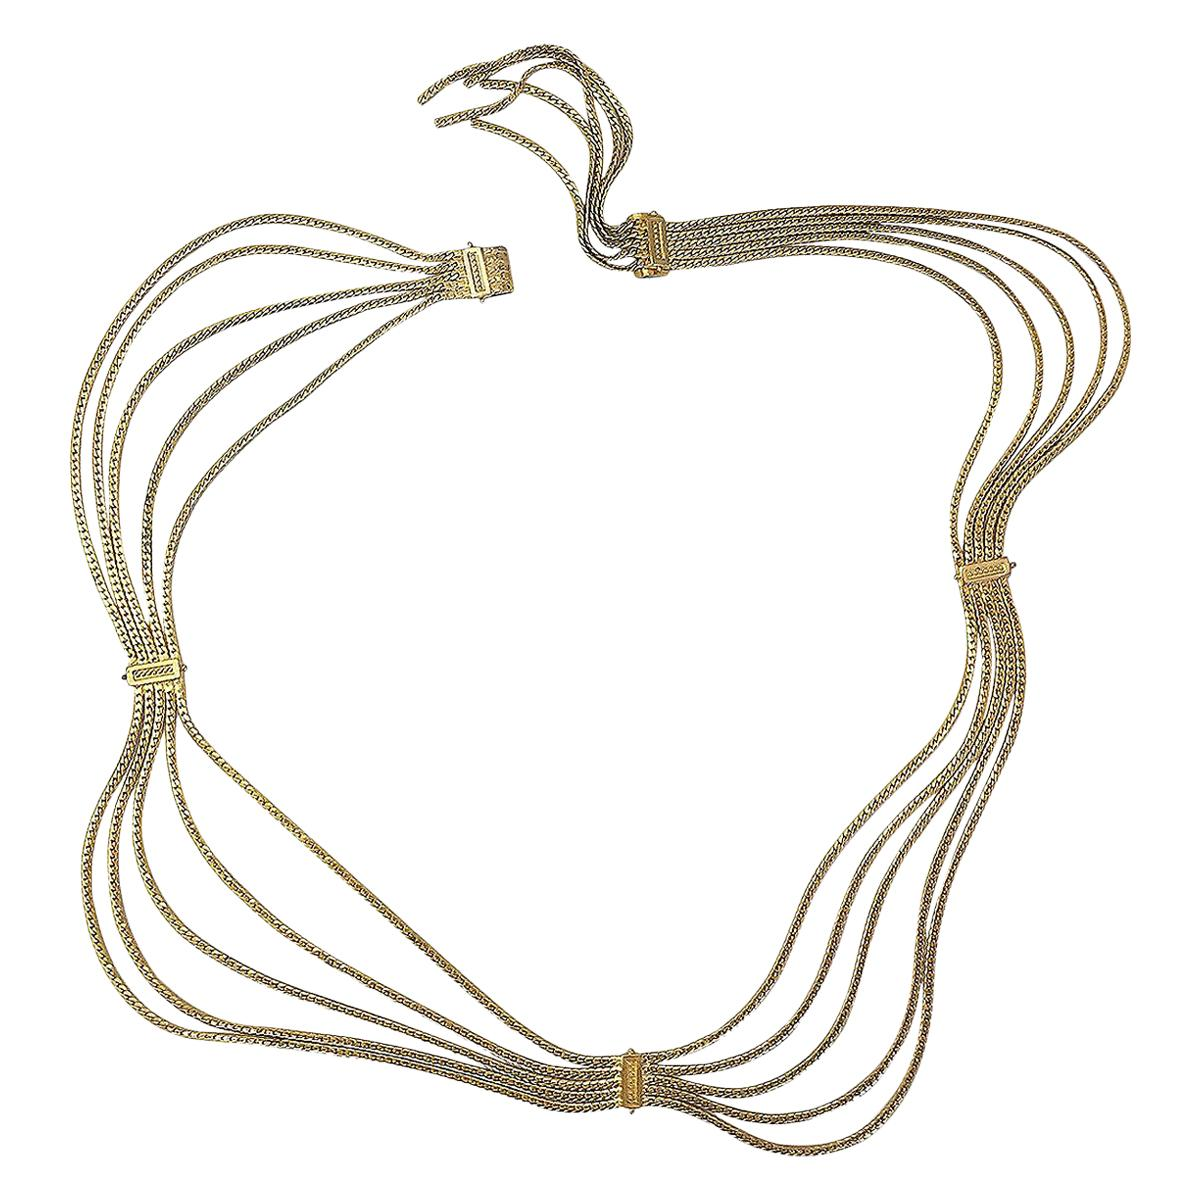 Christian Dior Multi-Strain Gold Tone Rope Chain belt